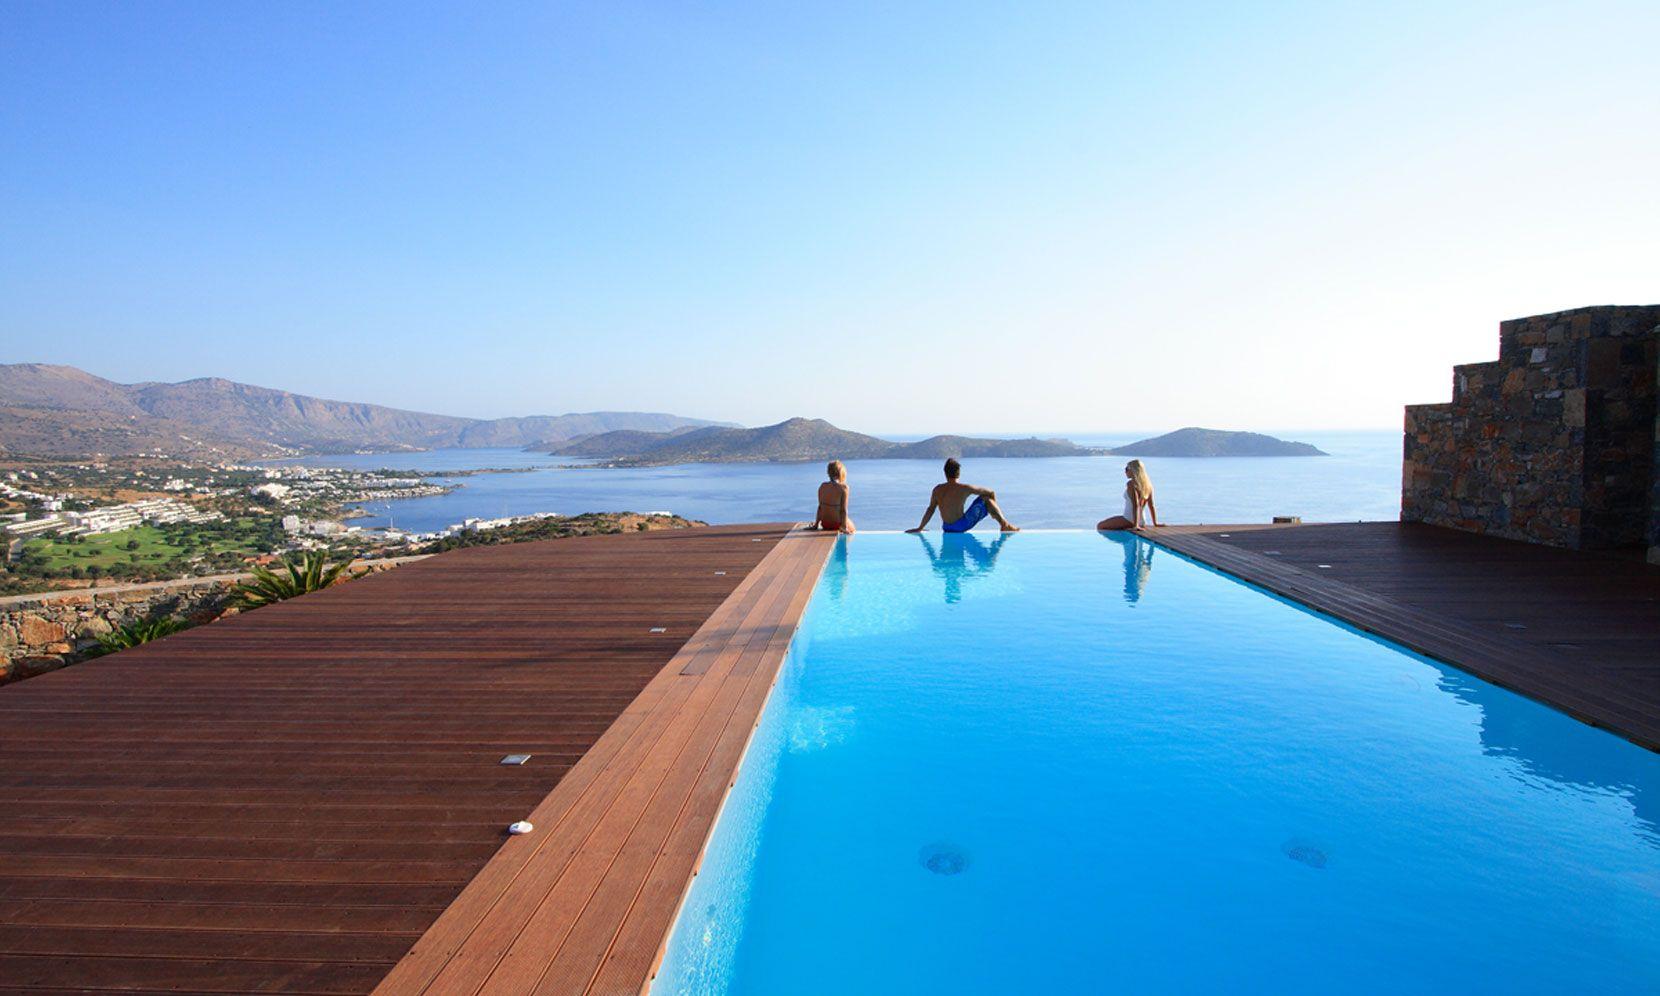 Crete Villa Black Onyx jumbotron image